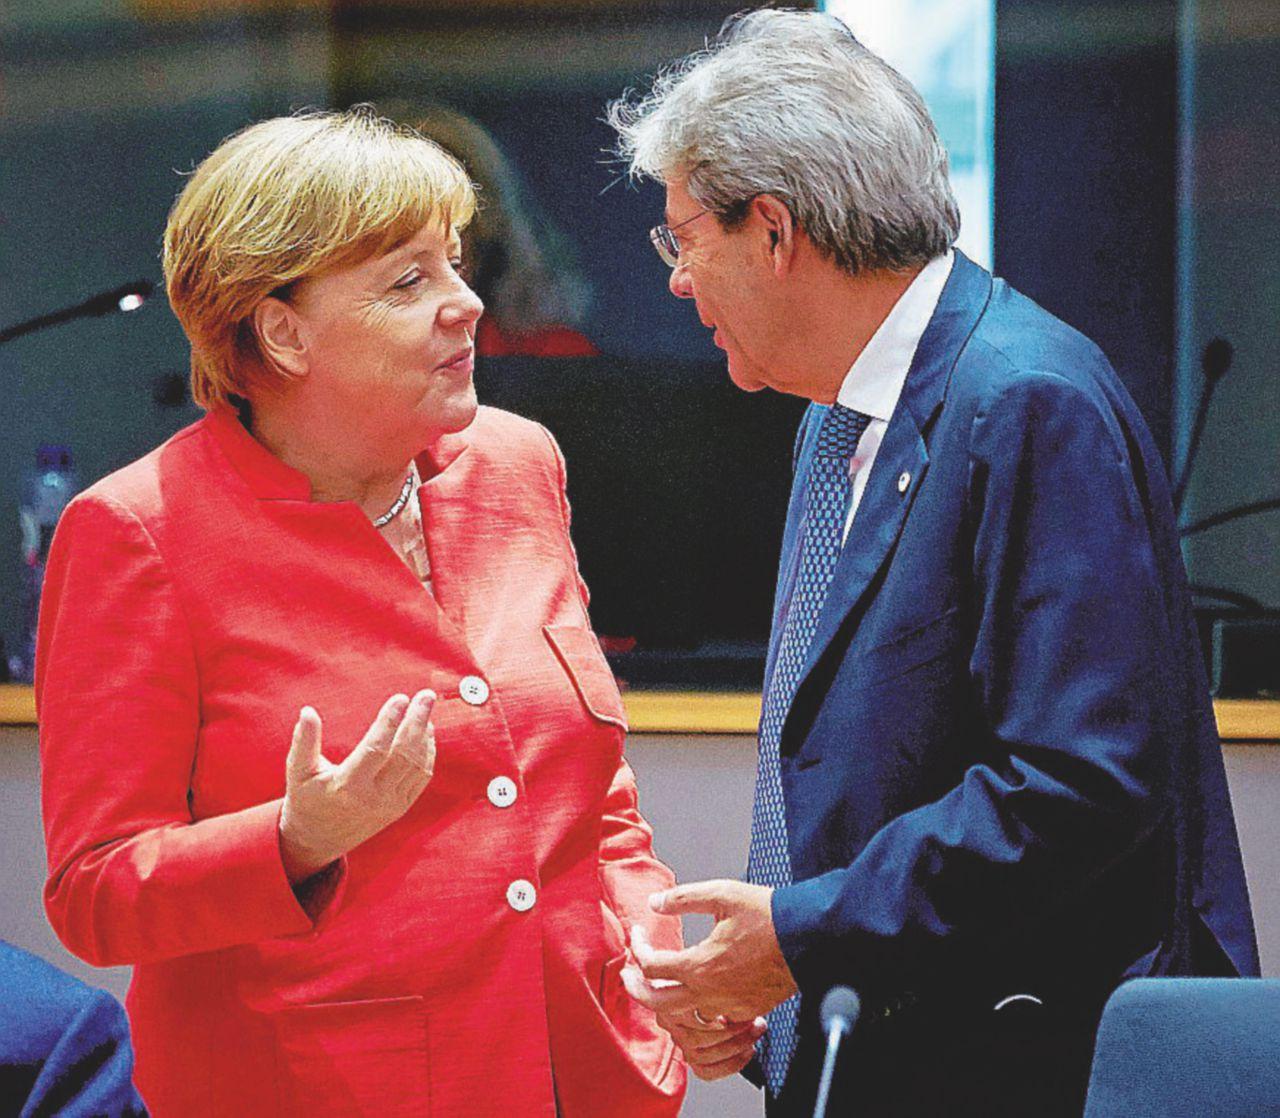 La svolta in tre mesi: l'Ue a Parigi benedice la linea di Minniti